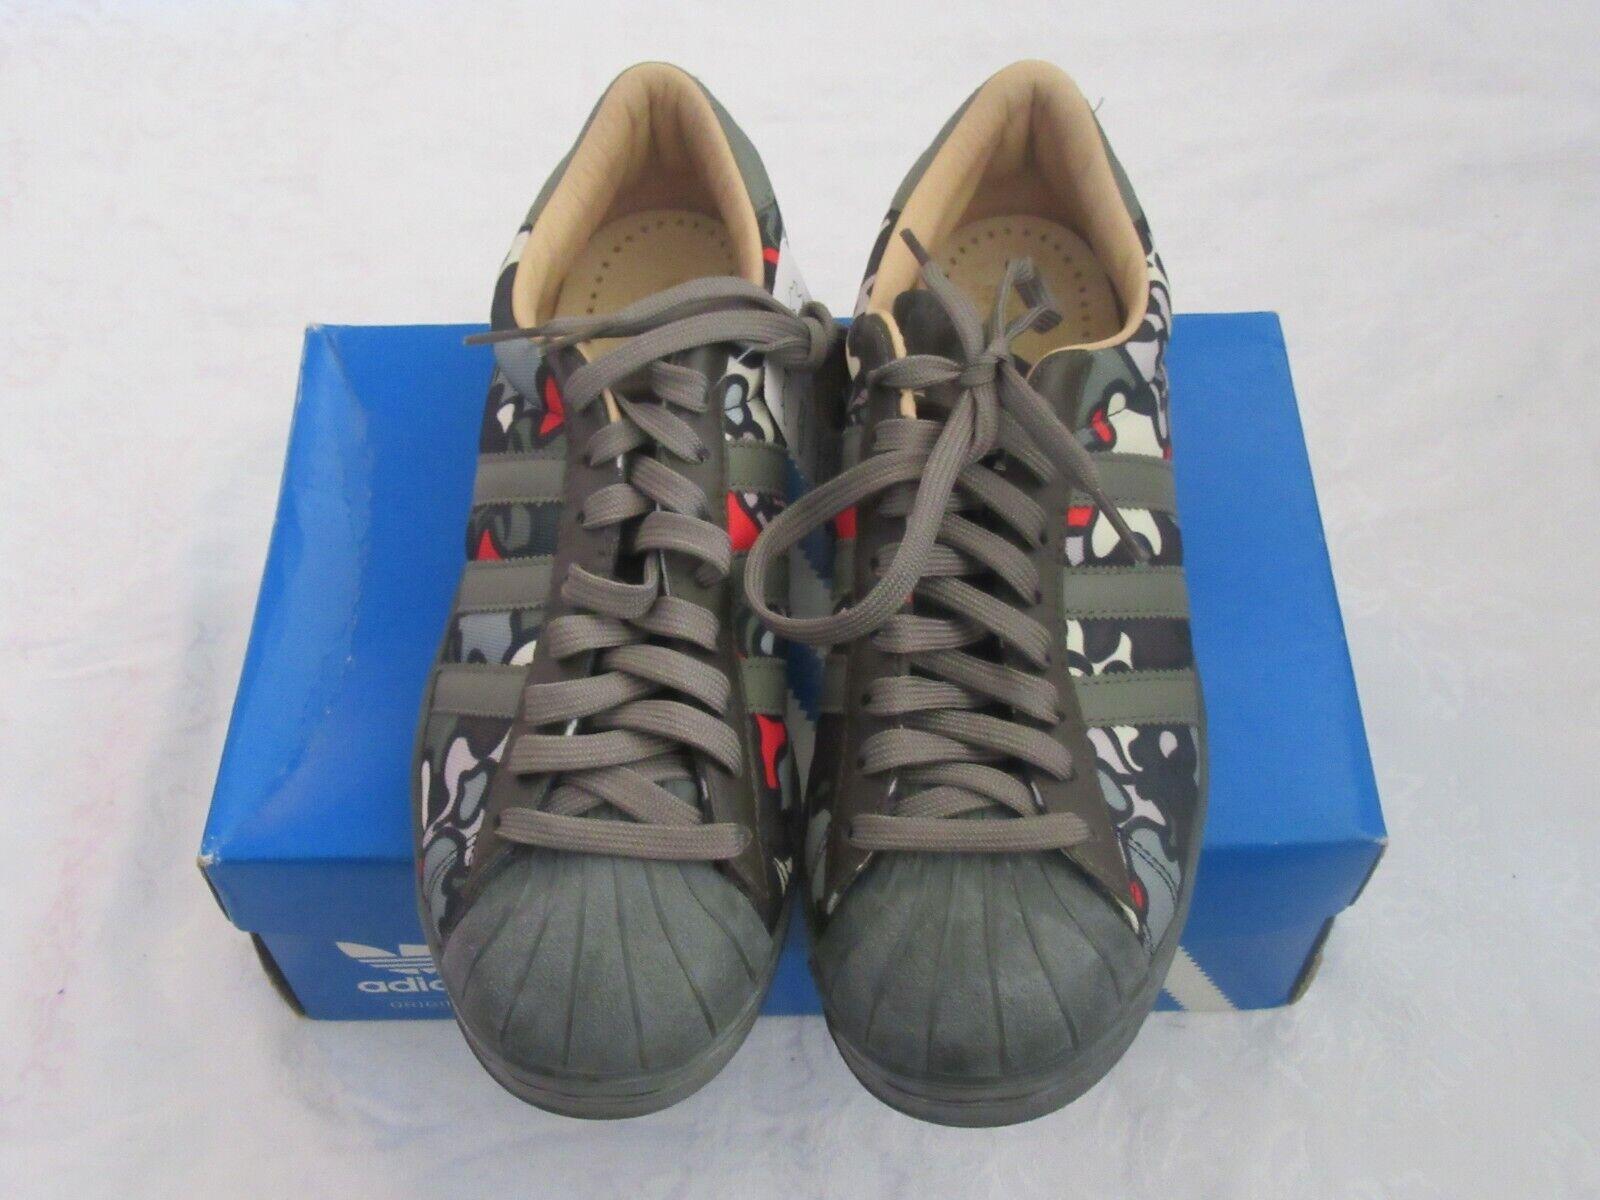 Adidas 659825 Superstar Vin Lux Originals Camo Bone Camouflage US Size 9 Sneaker